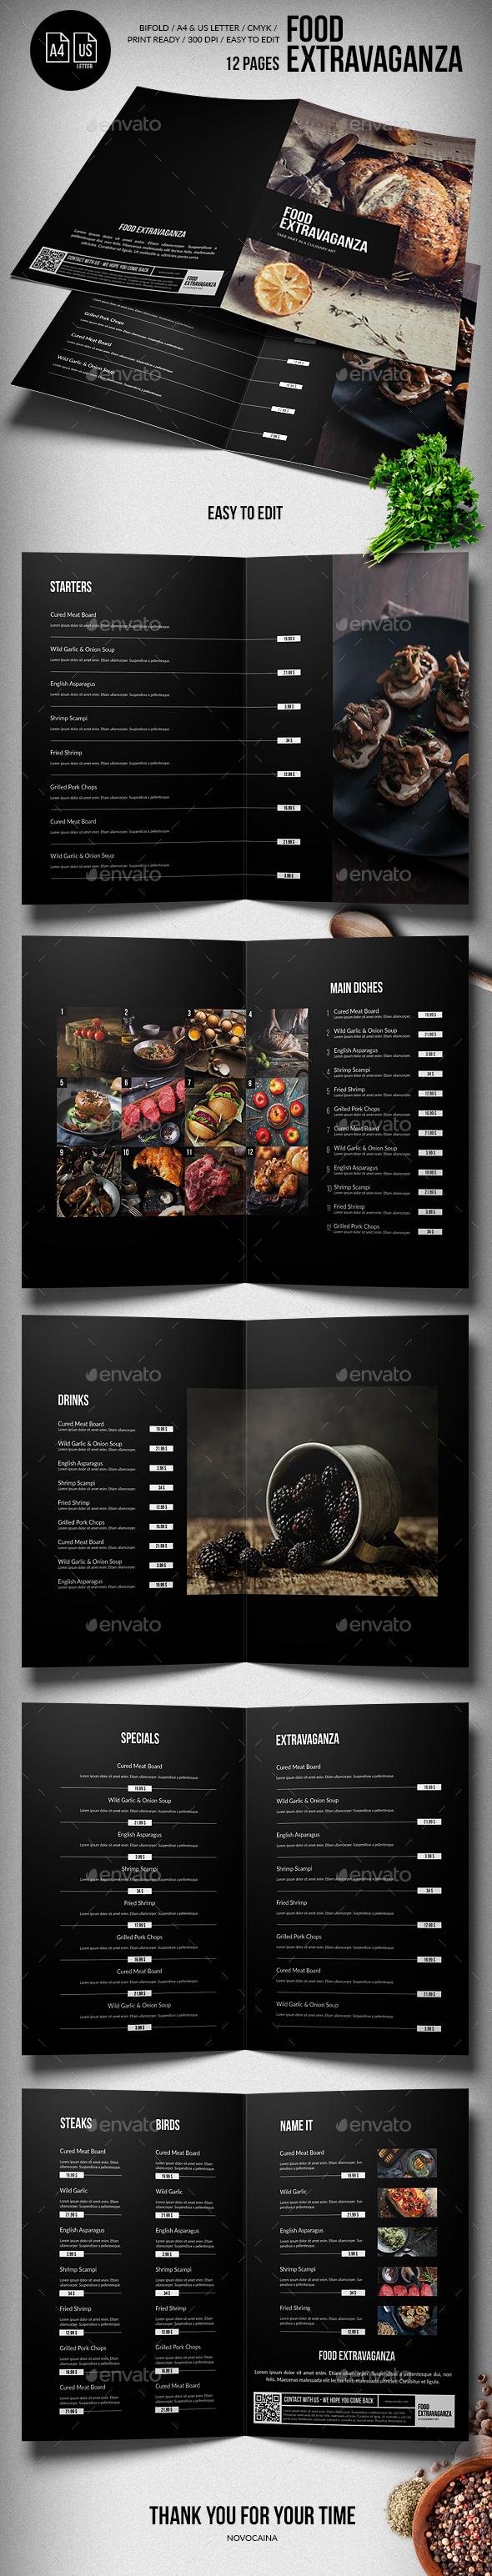 Multipurpose Extravaganza  Food Menu - 12 pgs - A4 & US Letter - Food Menus Print Templates